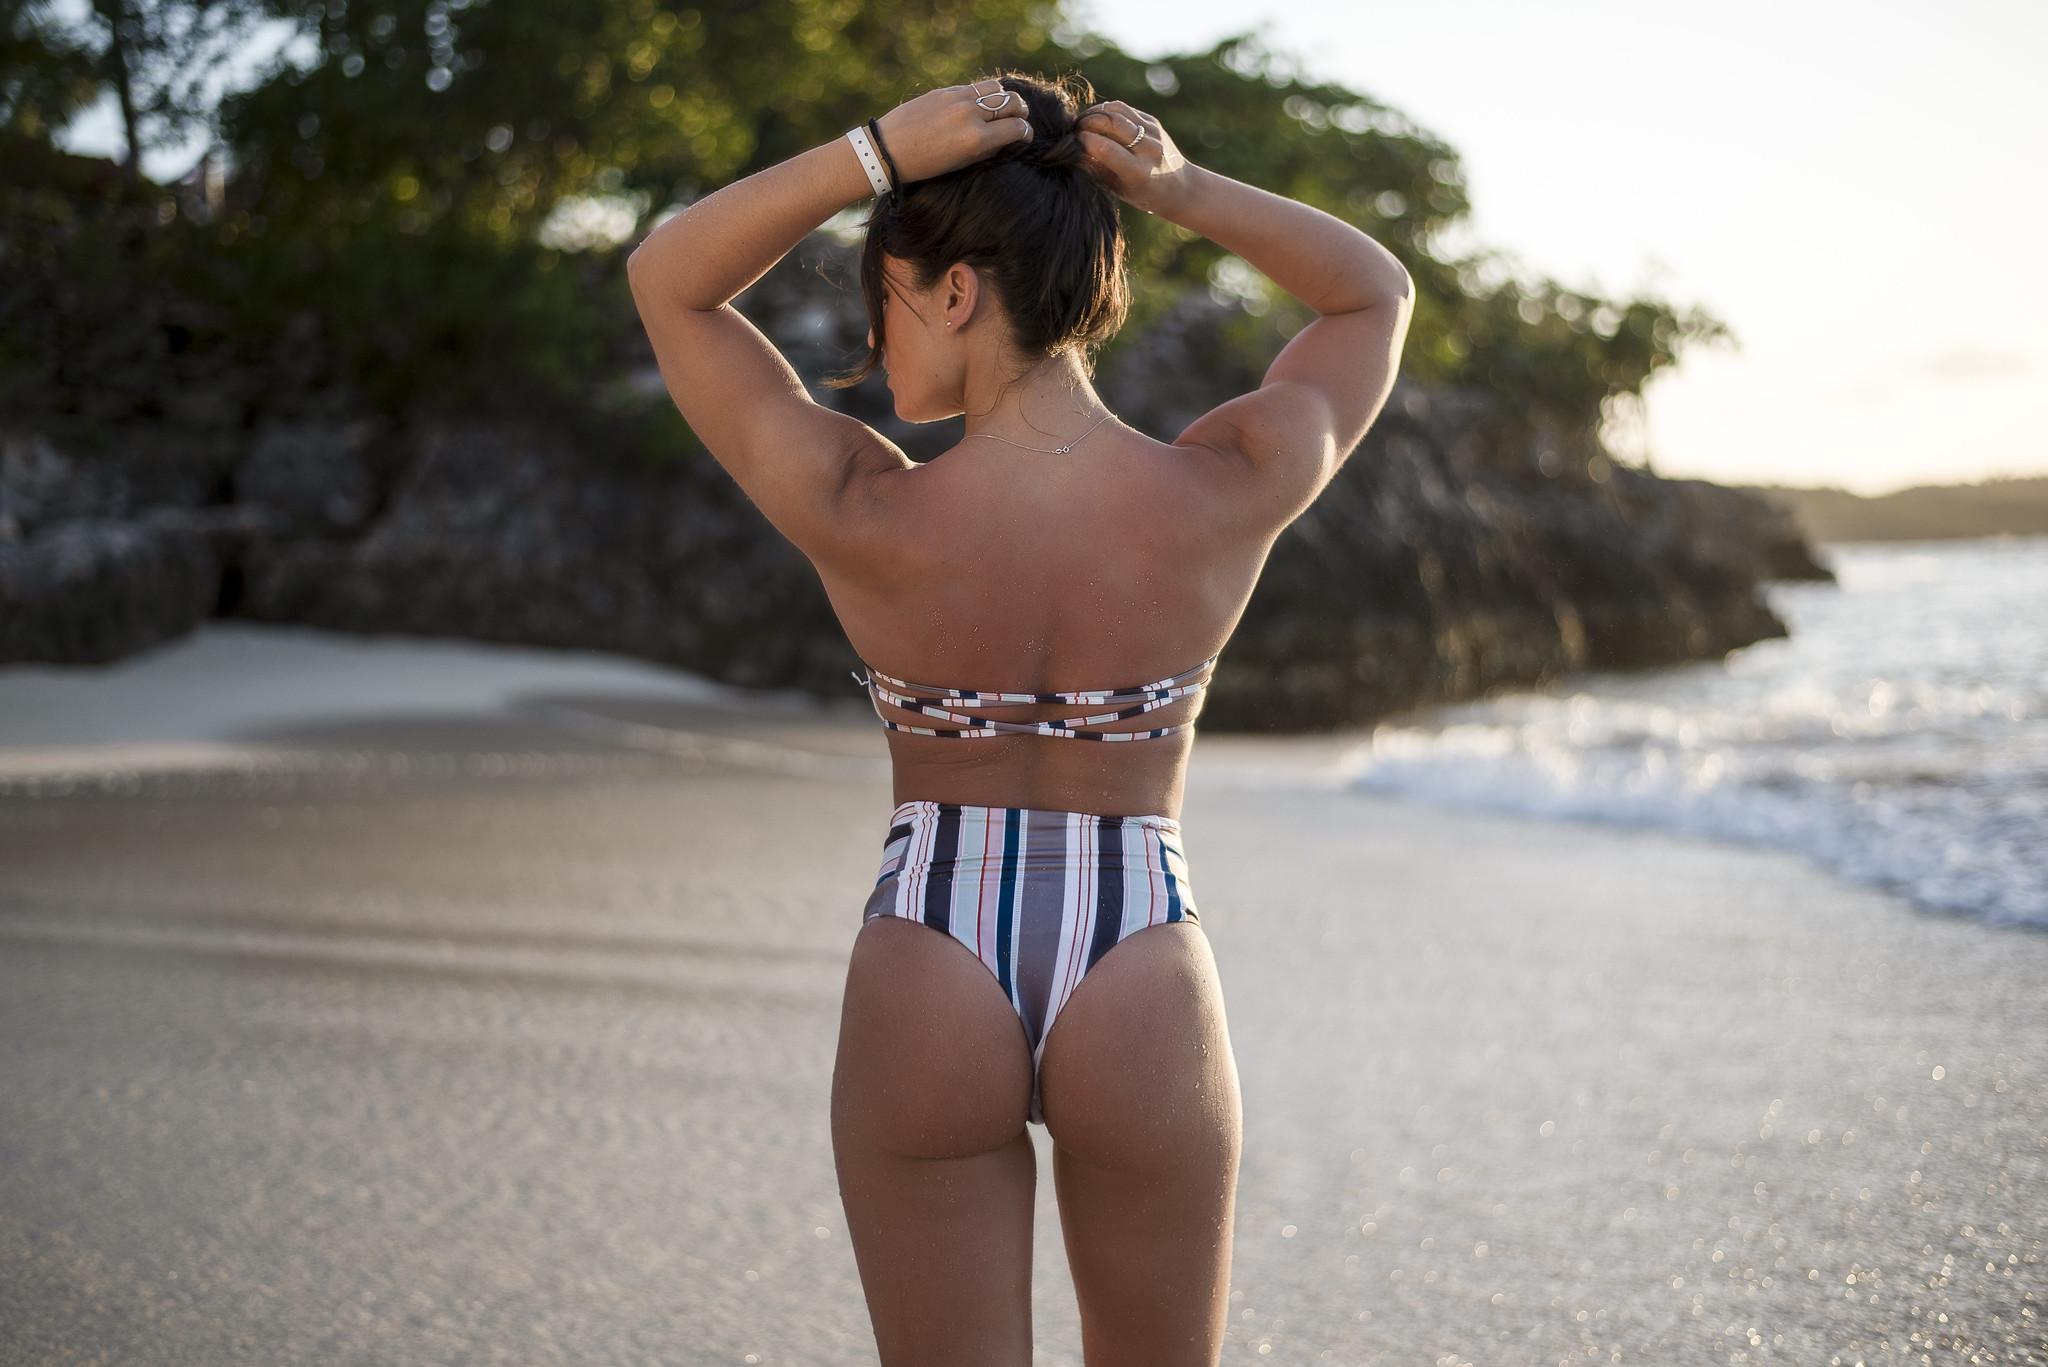 camille dg bikini taille haute cuba plage